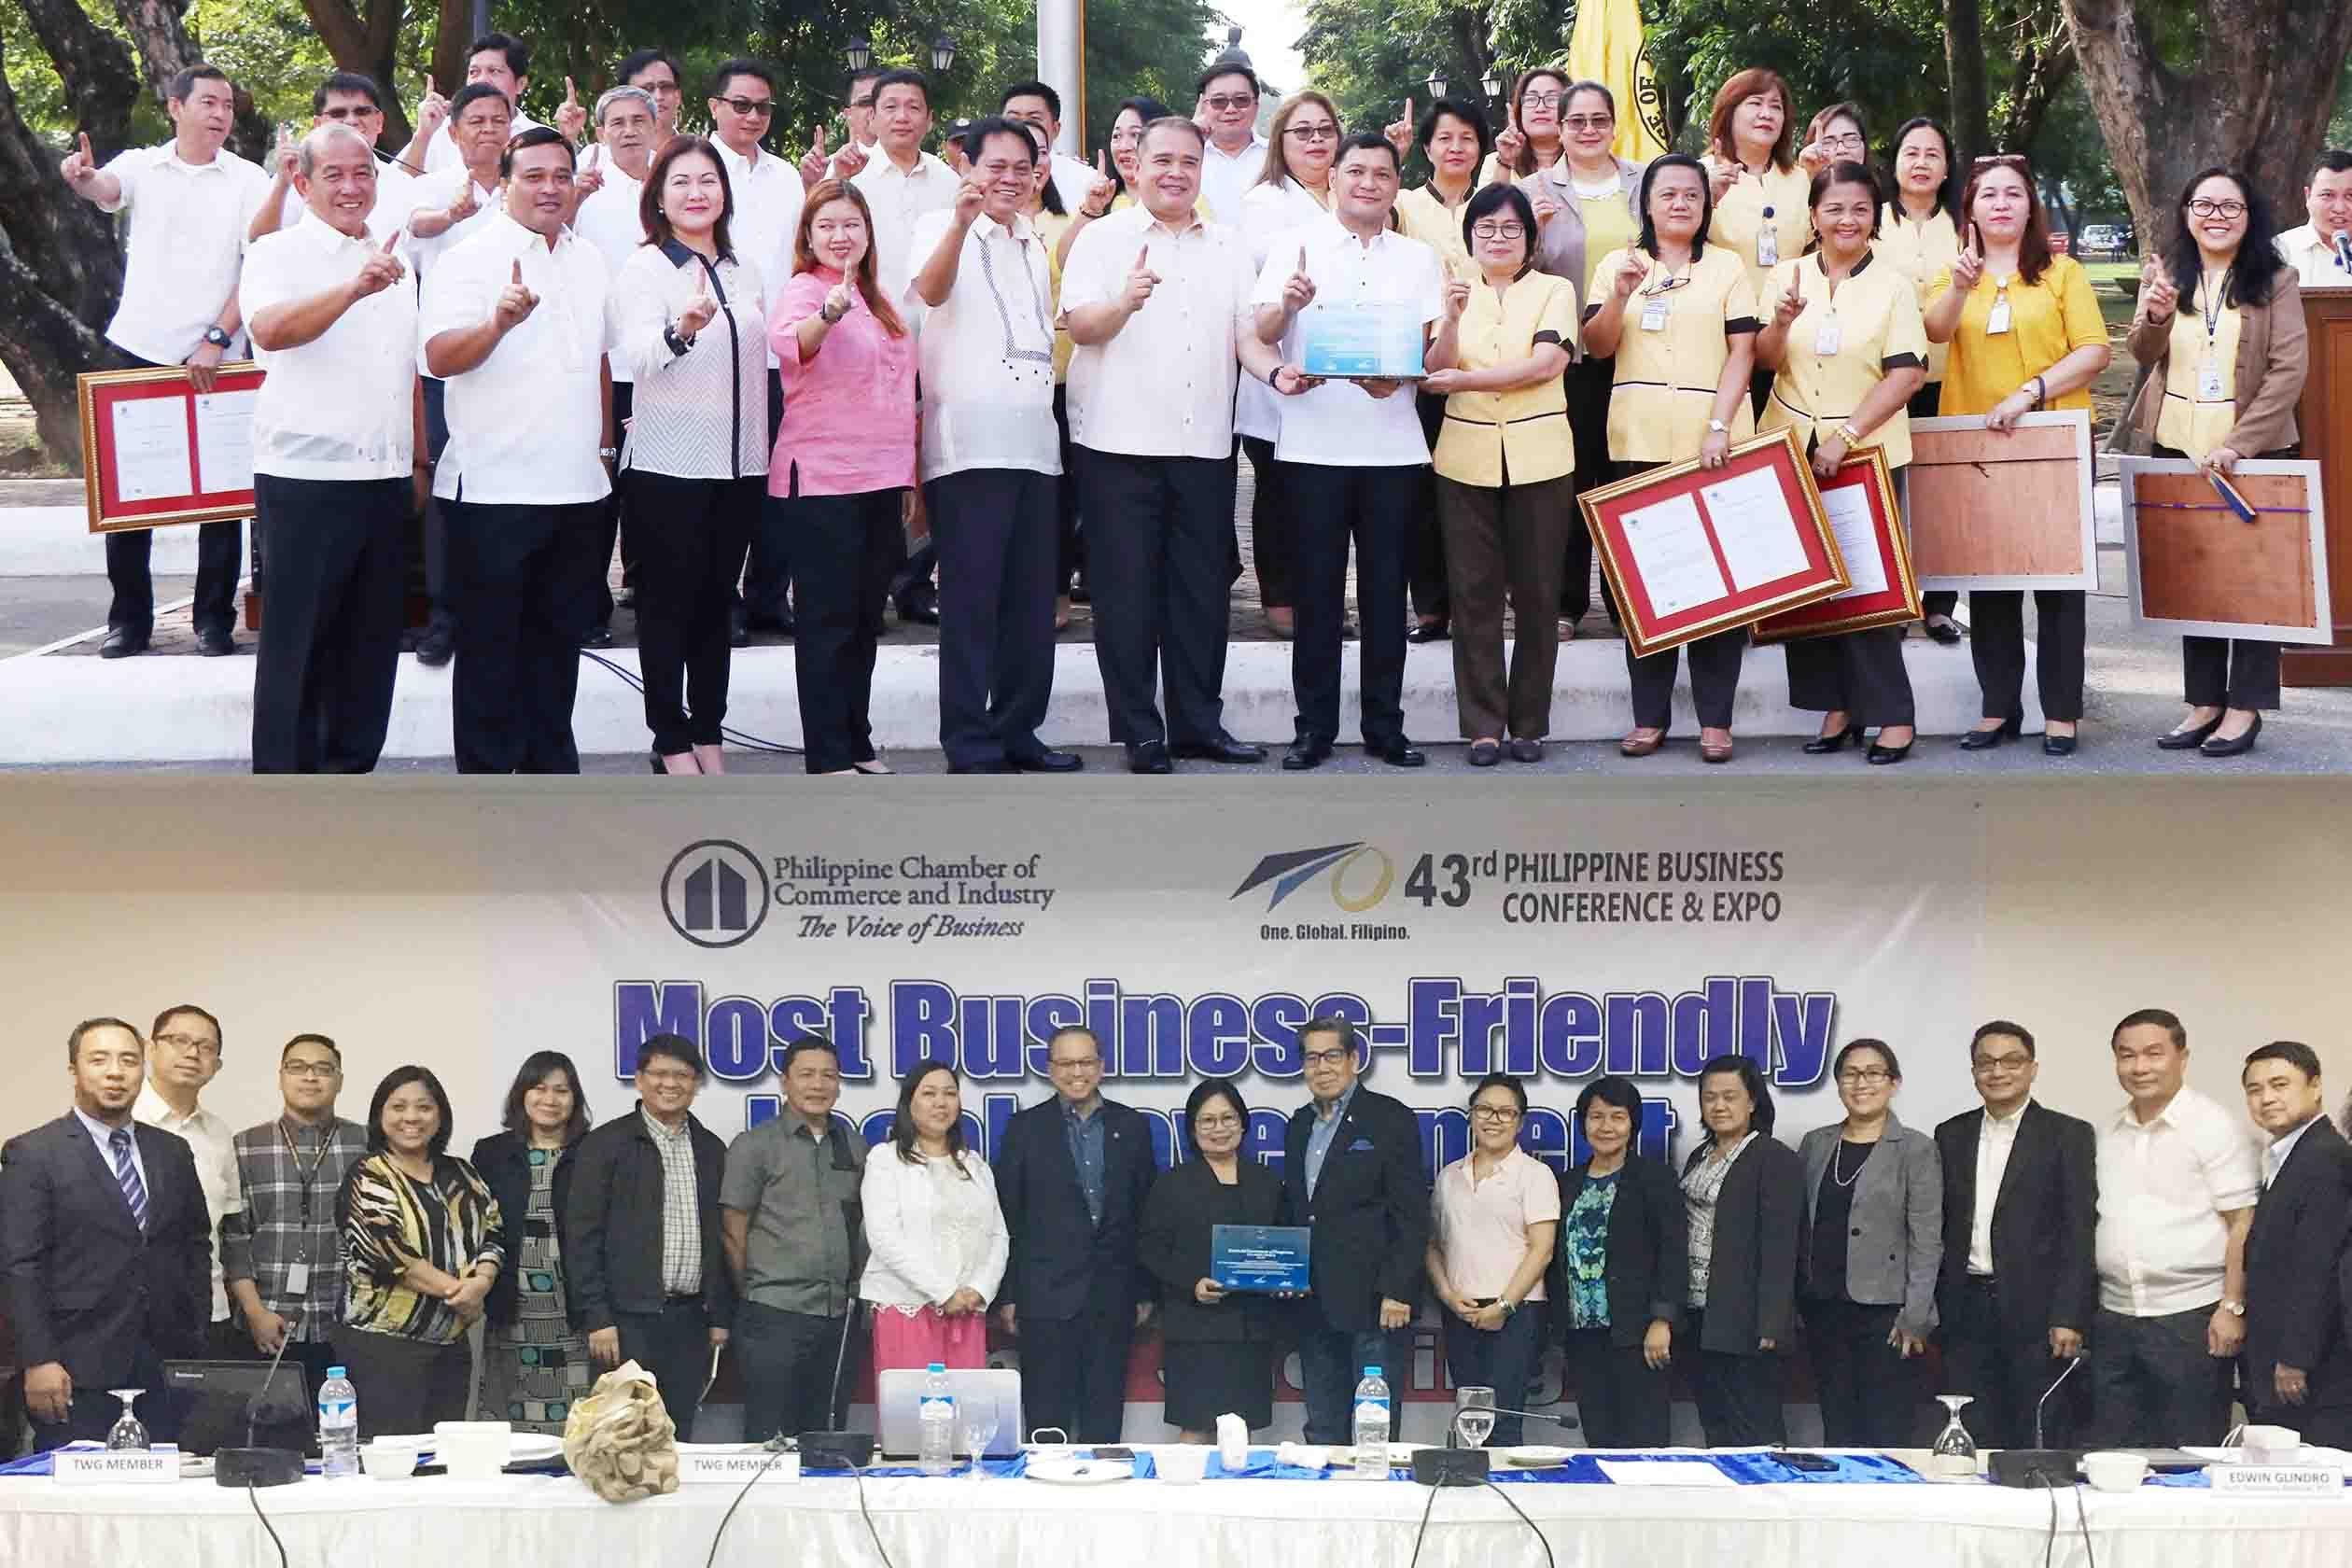 business-friendly finalist